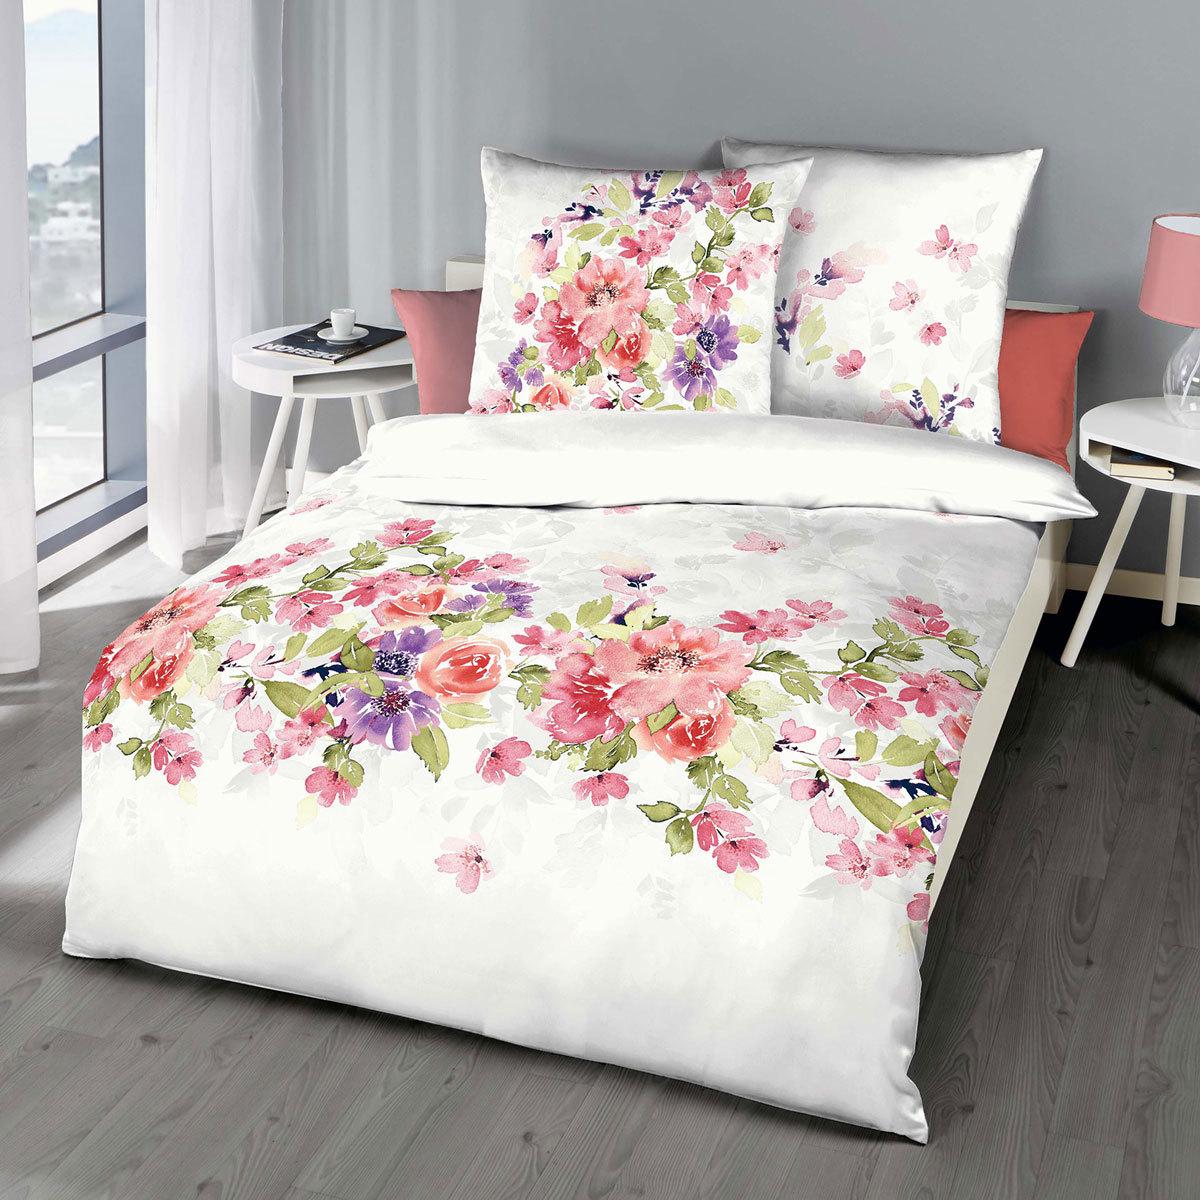 kaeppel mako satin bettw sche fabienne rot haehnchen karlsruhe. Black Bedroom Furniture Sets. Home Design Ideas